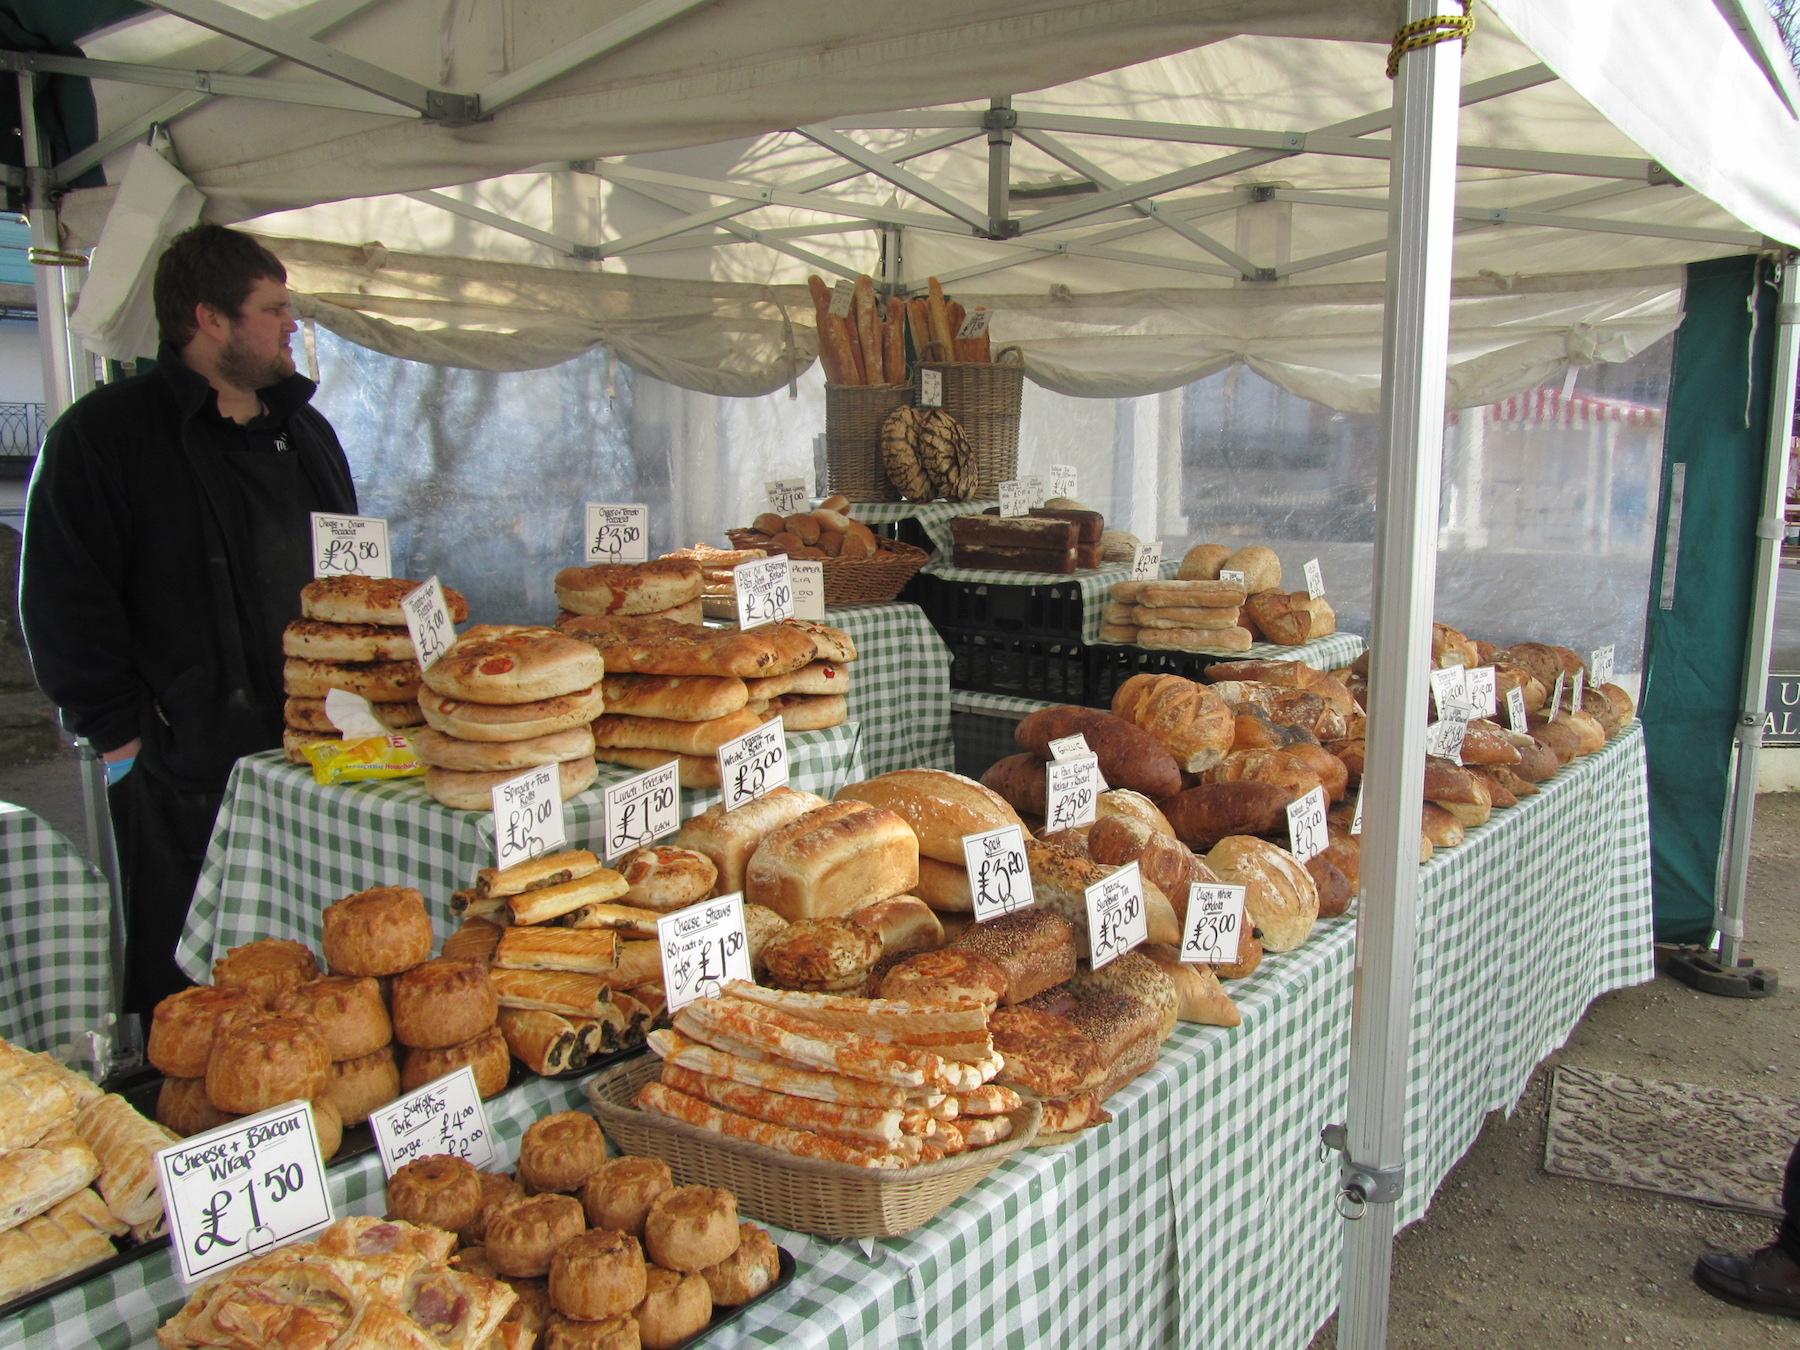 Market stall, Tunbridge Wells